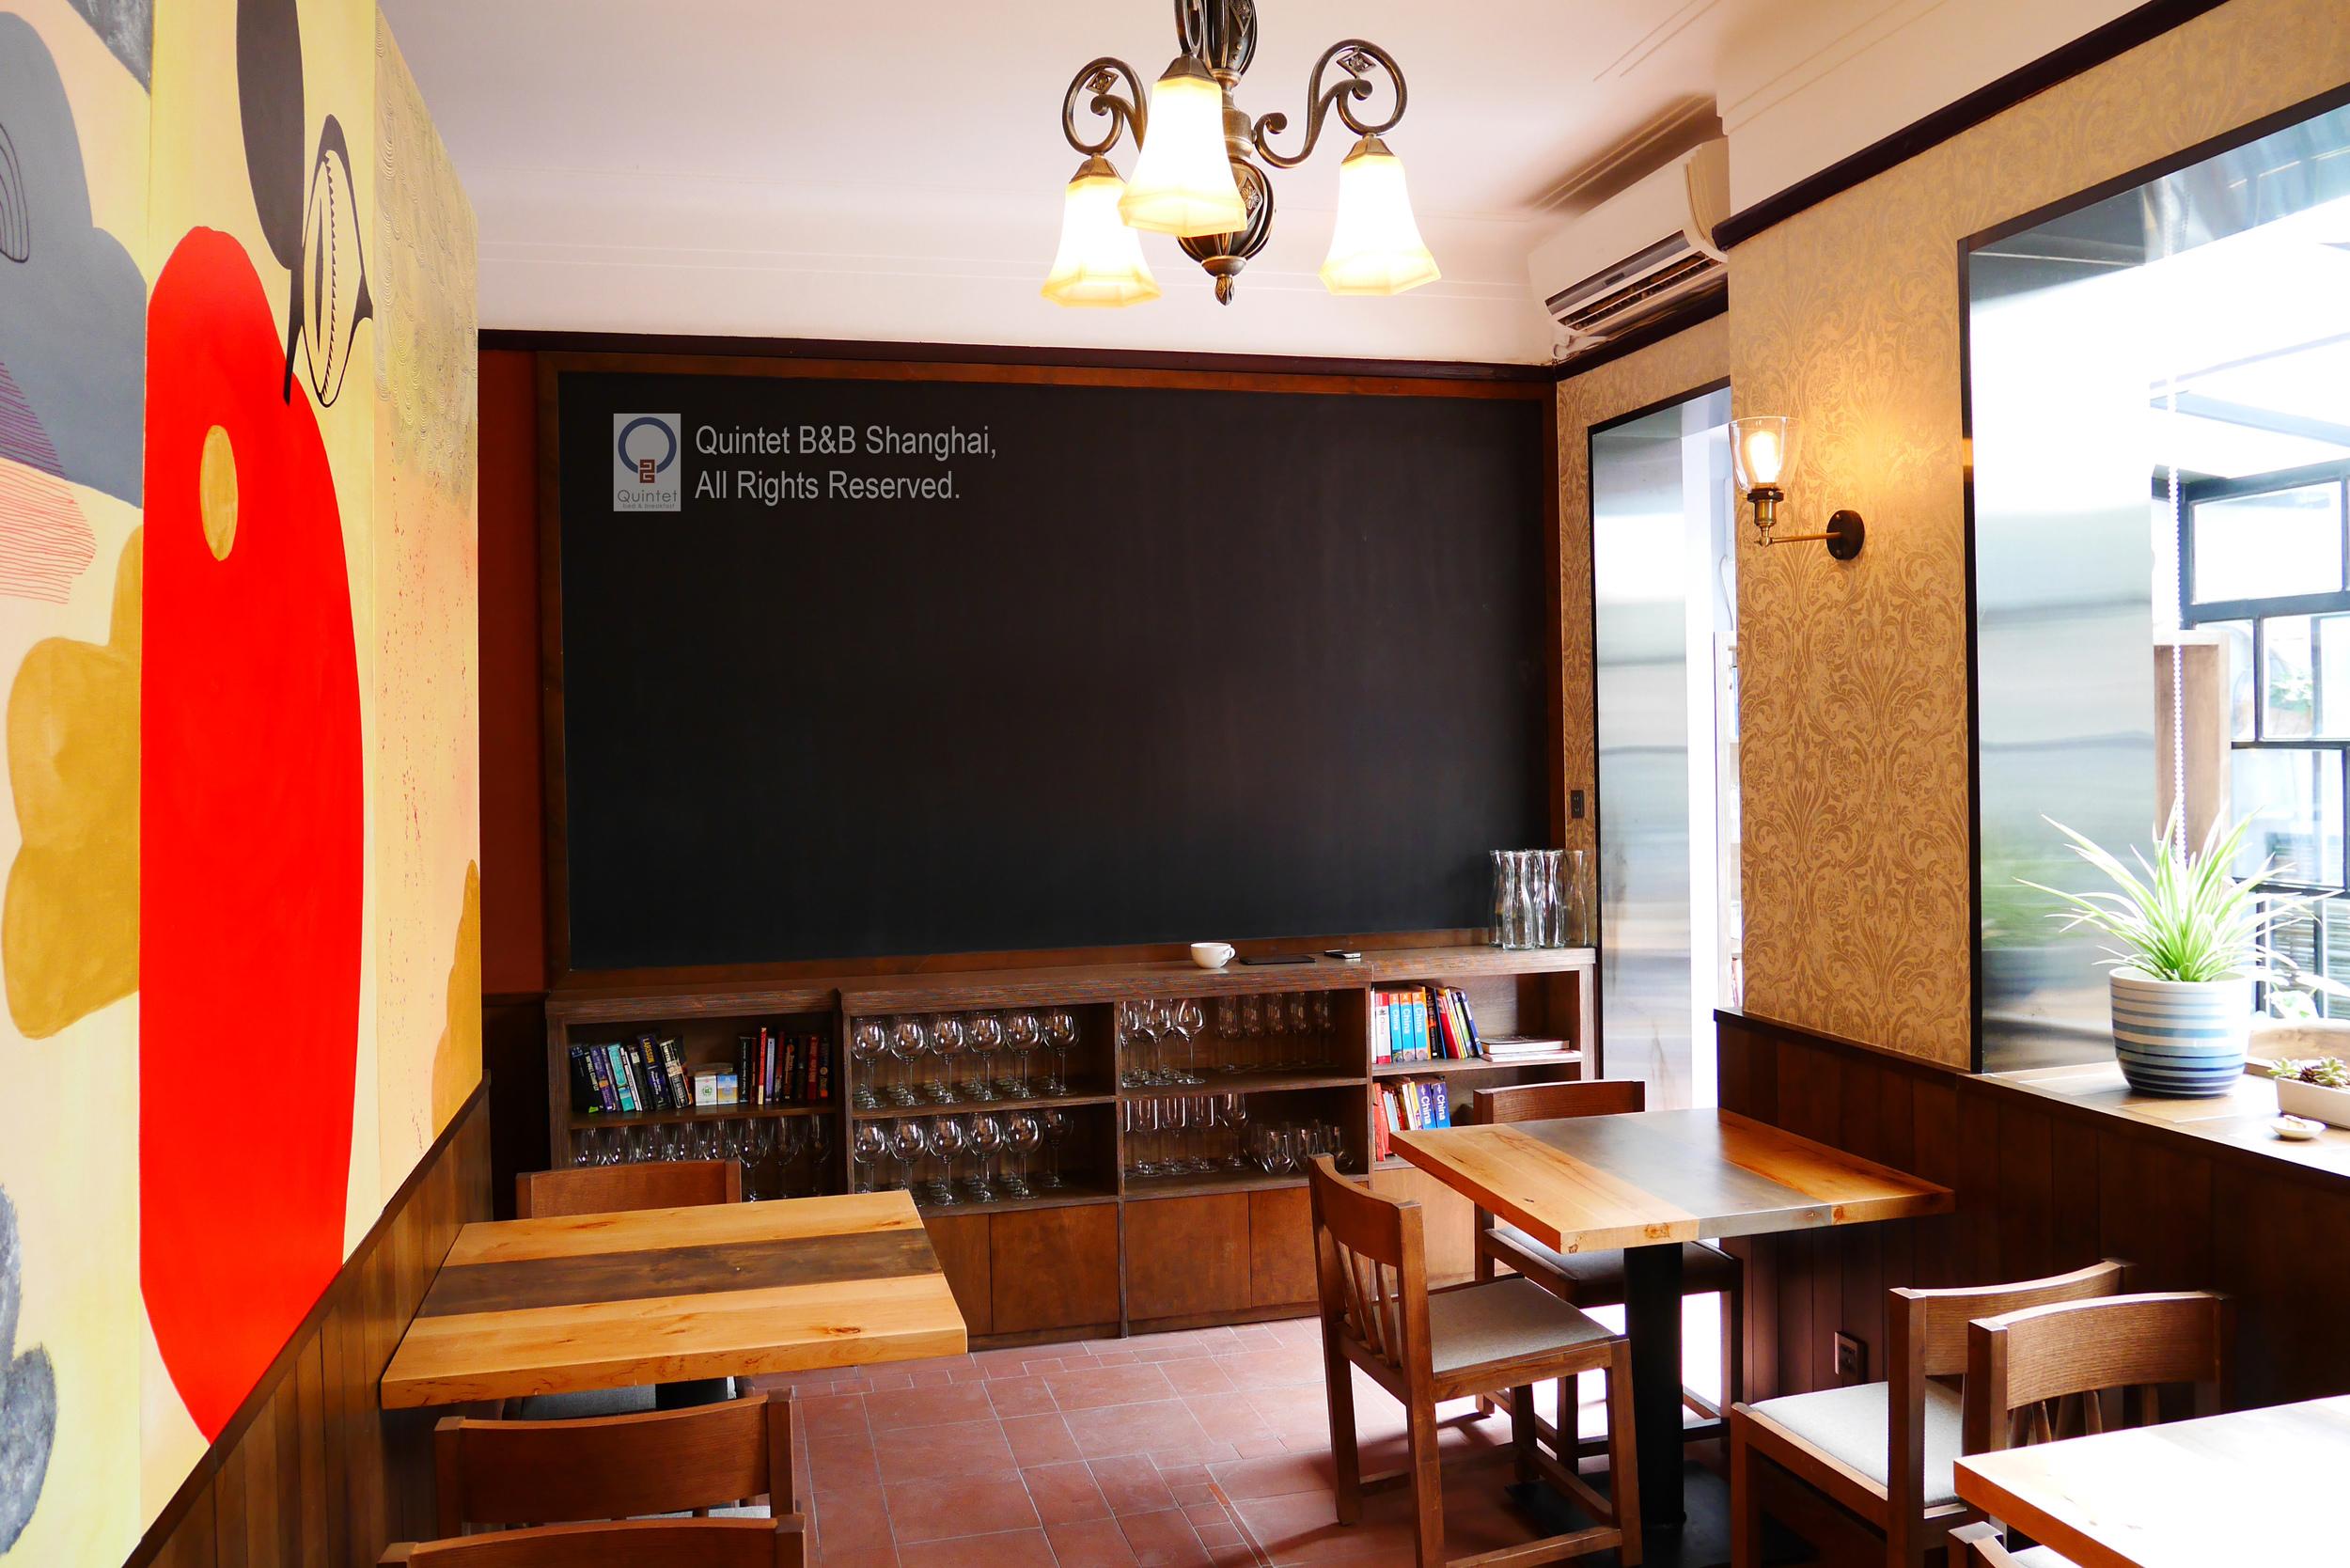 Shanghai Quintet bed and breakfast_Private Kitchen 808 (4).JPG